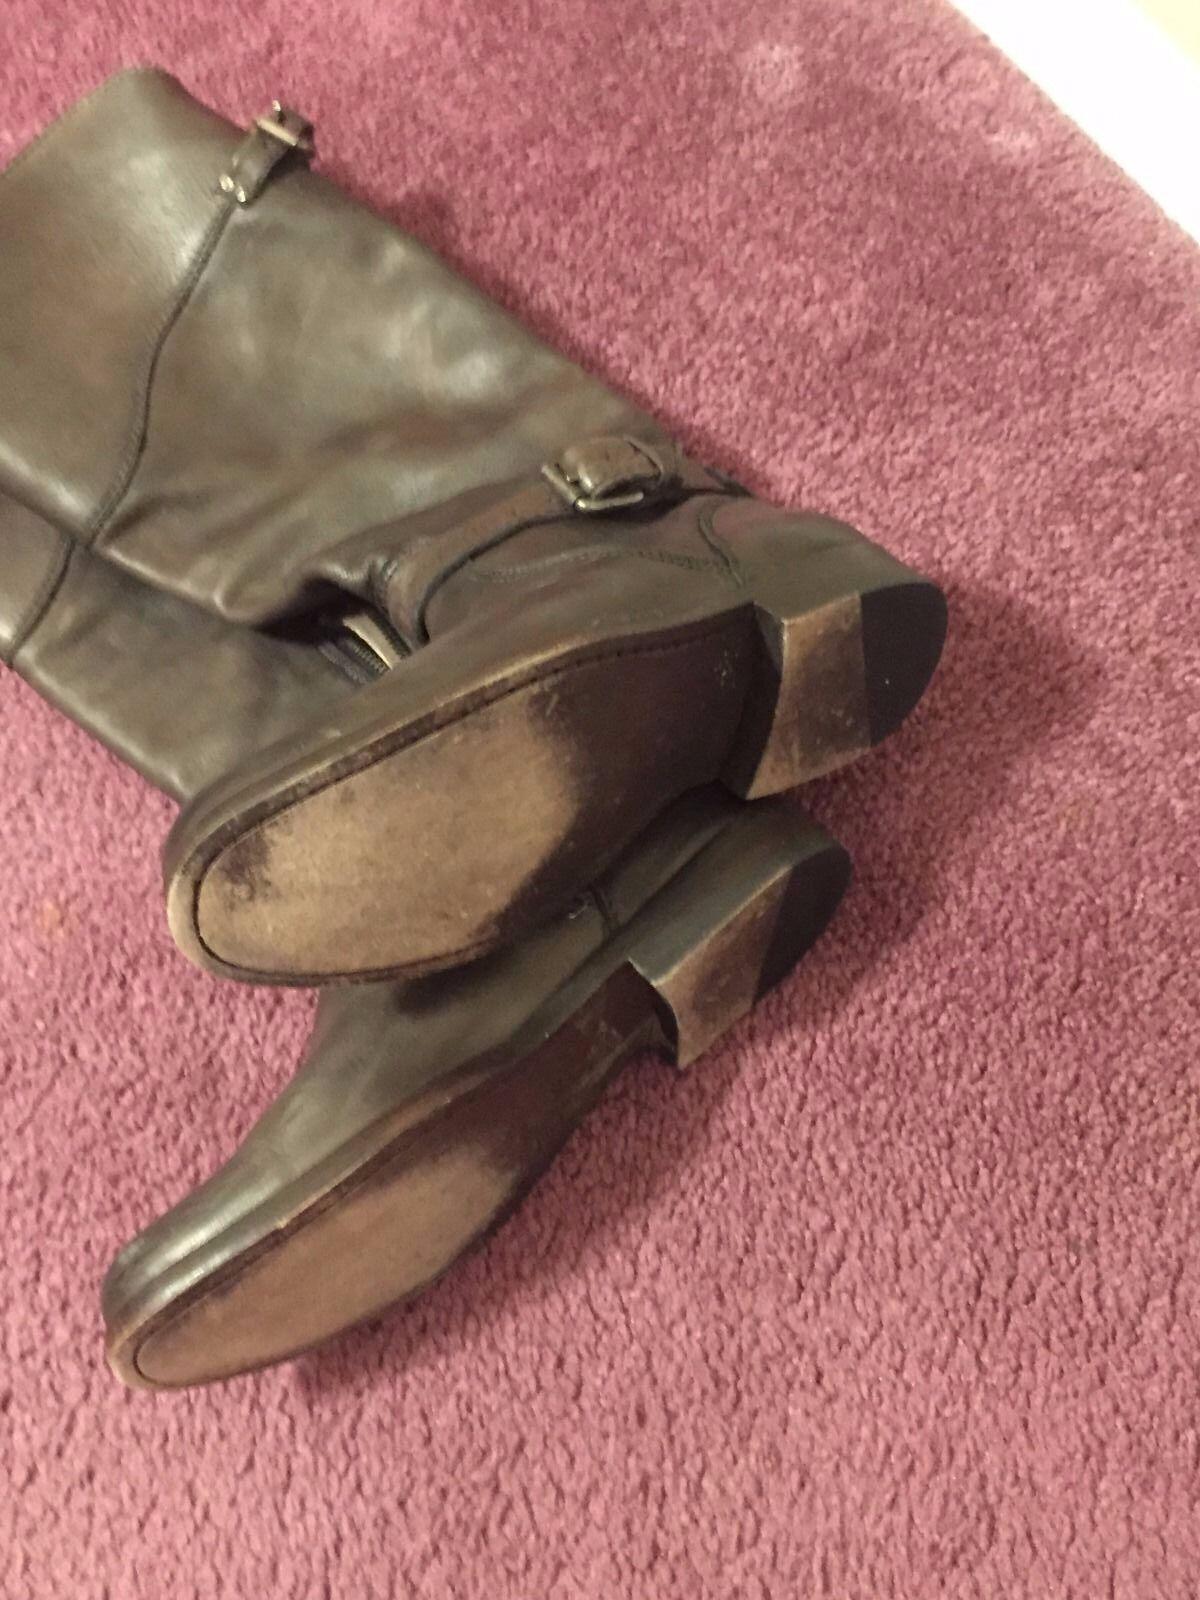 FRYE Phillip Phillip Phillip Vintage Leather Riding Boots Brown Women's Size 7.5  395 8a5f32